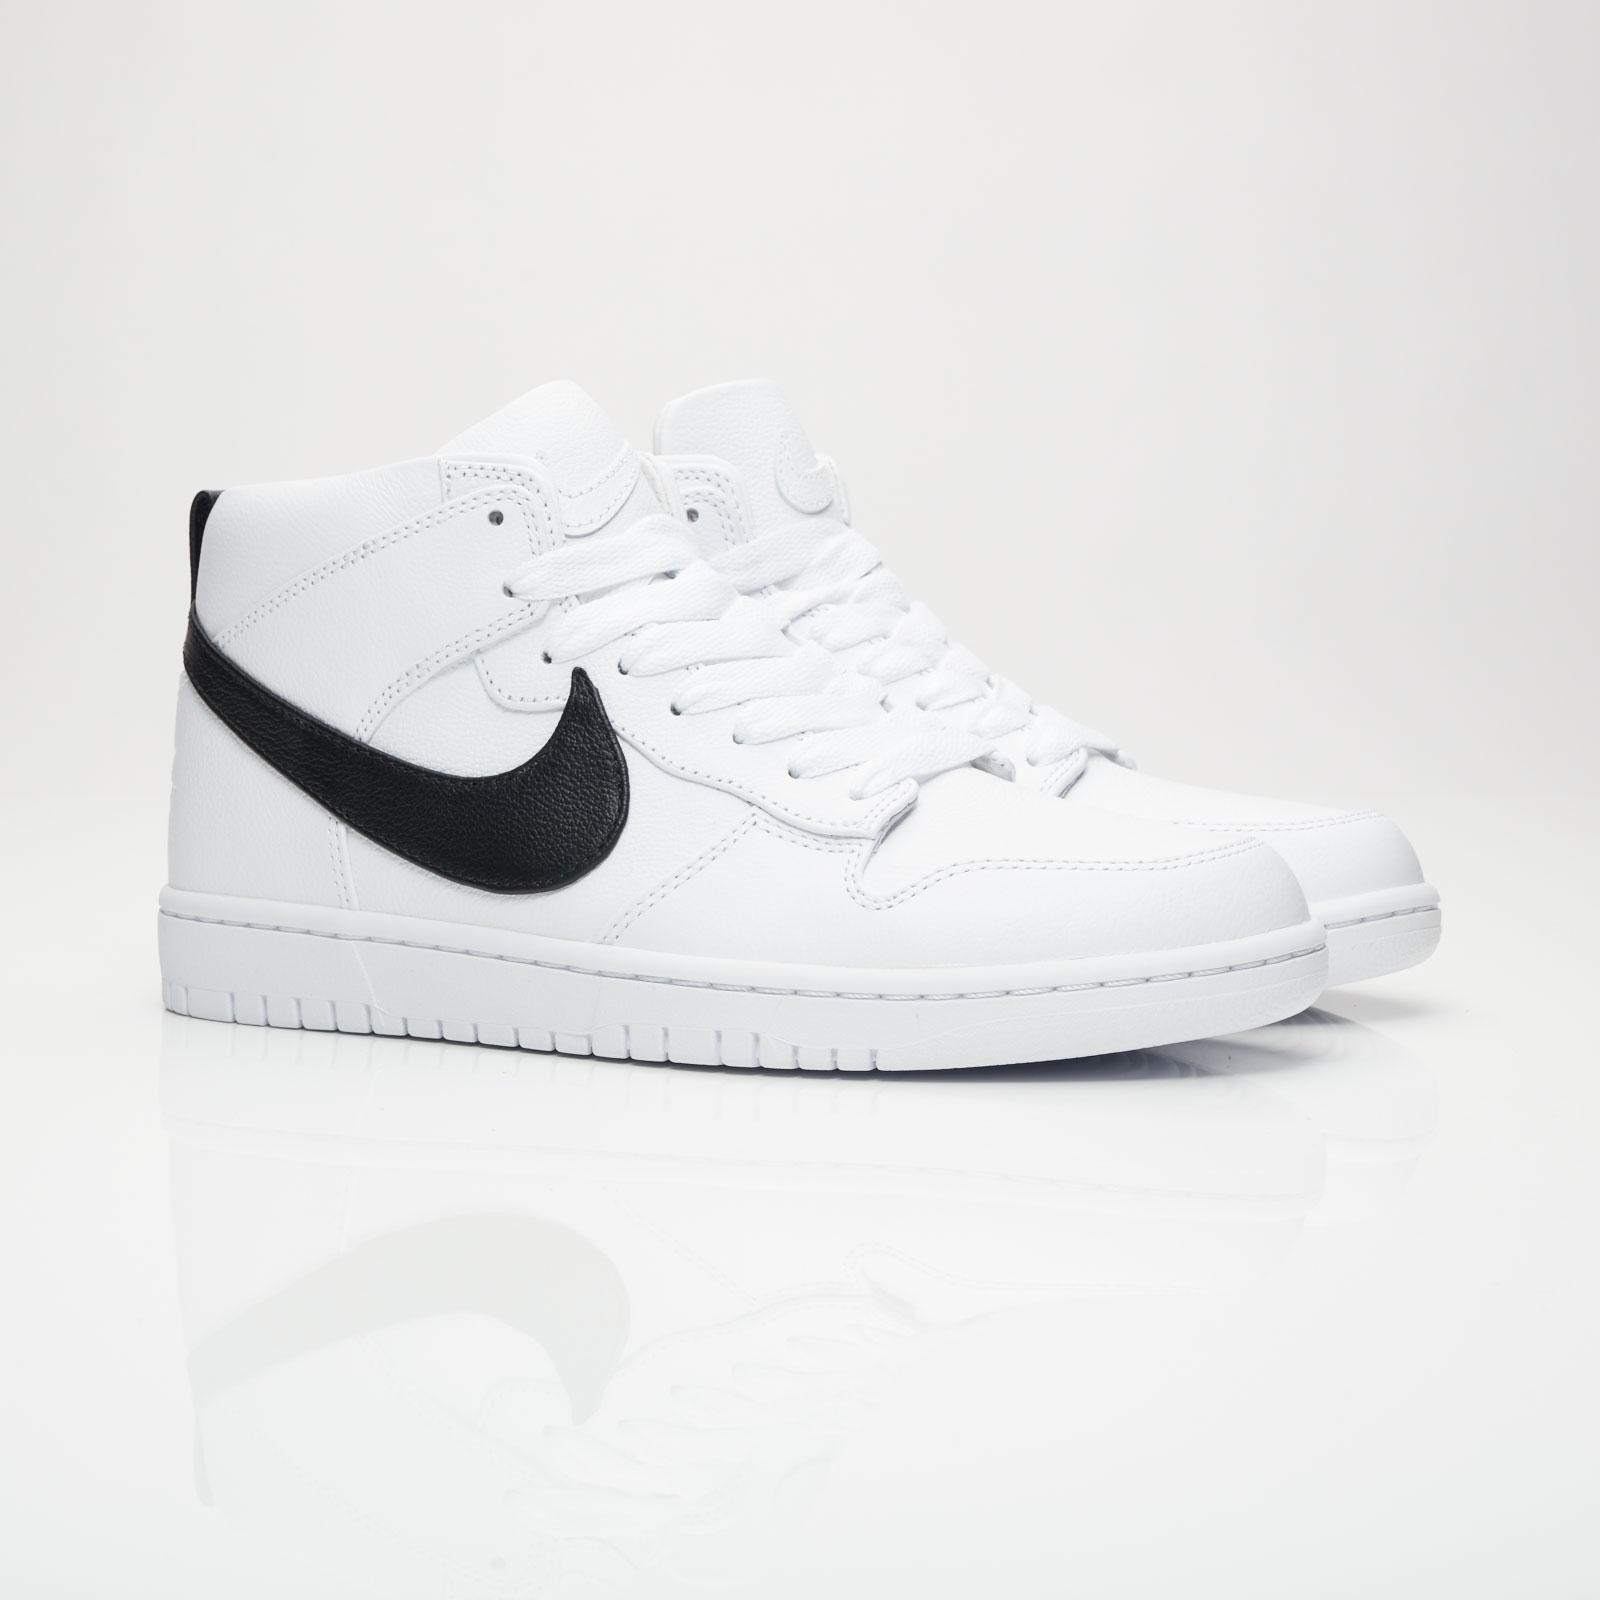 ca8be21bd44f7 Nike Dunk Lux Chukka   Rt - 910088-101 - Sneakersnstuff